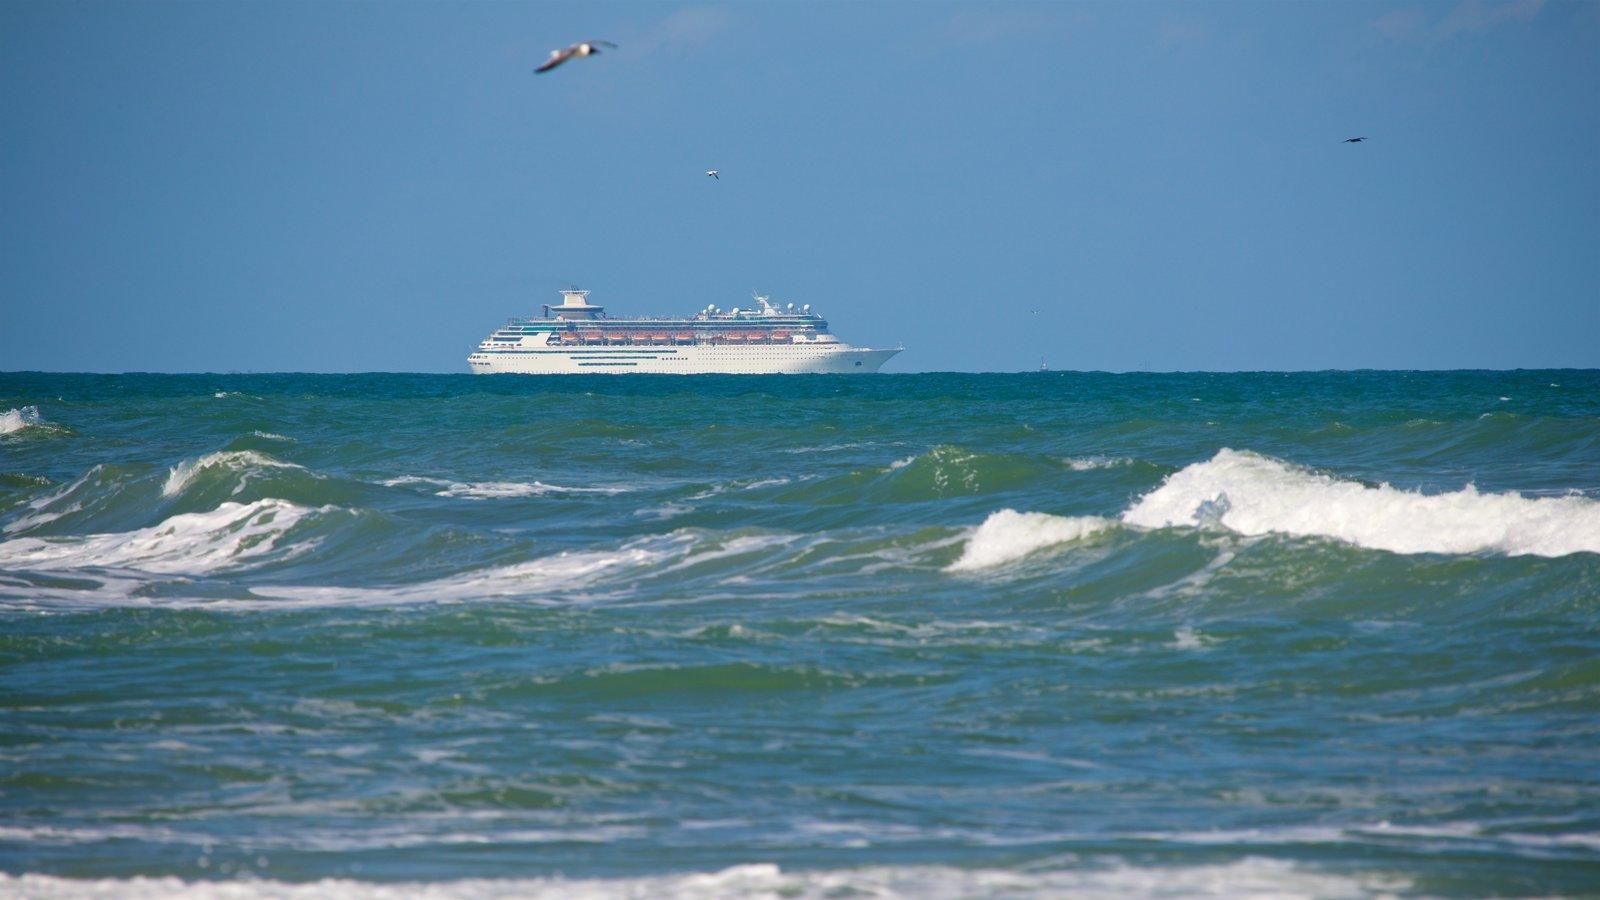 Cocoa Beach featuring cruising, general coastal views and waves